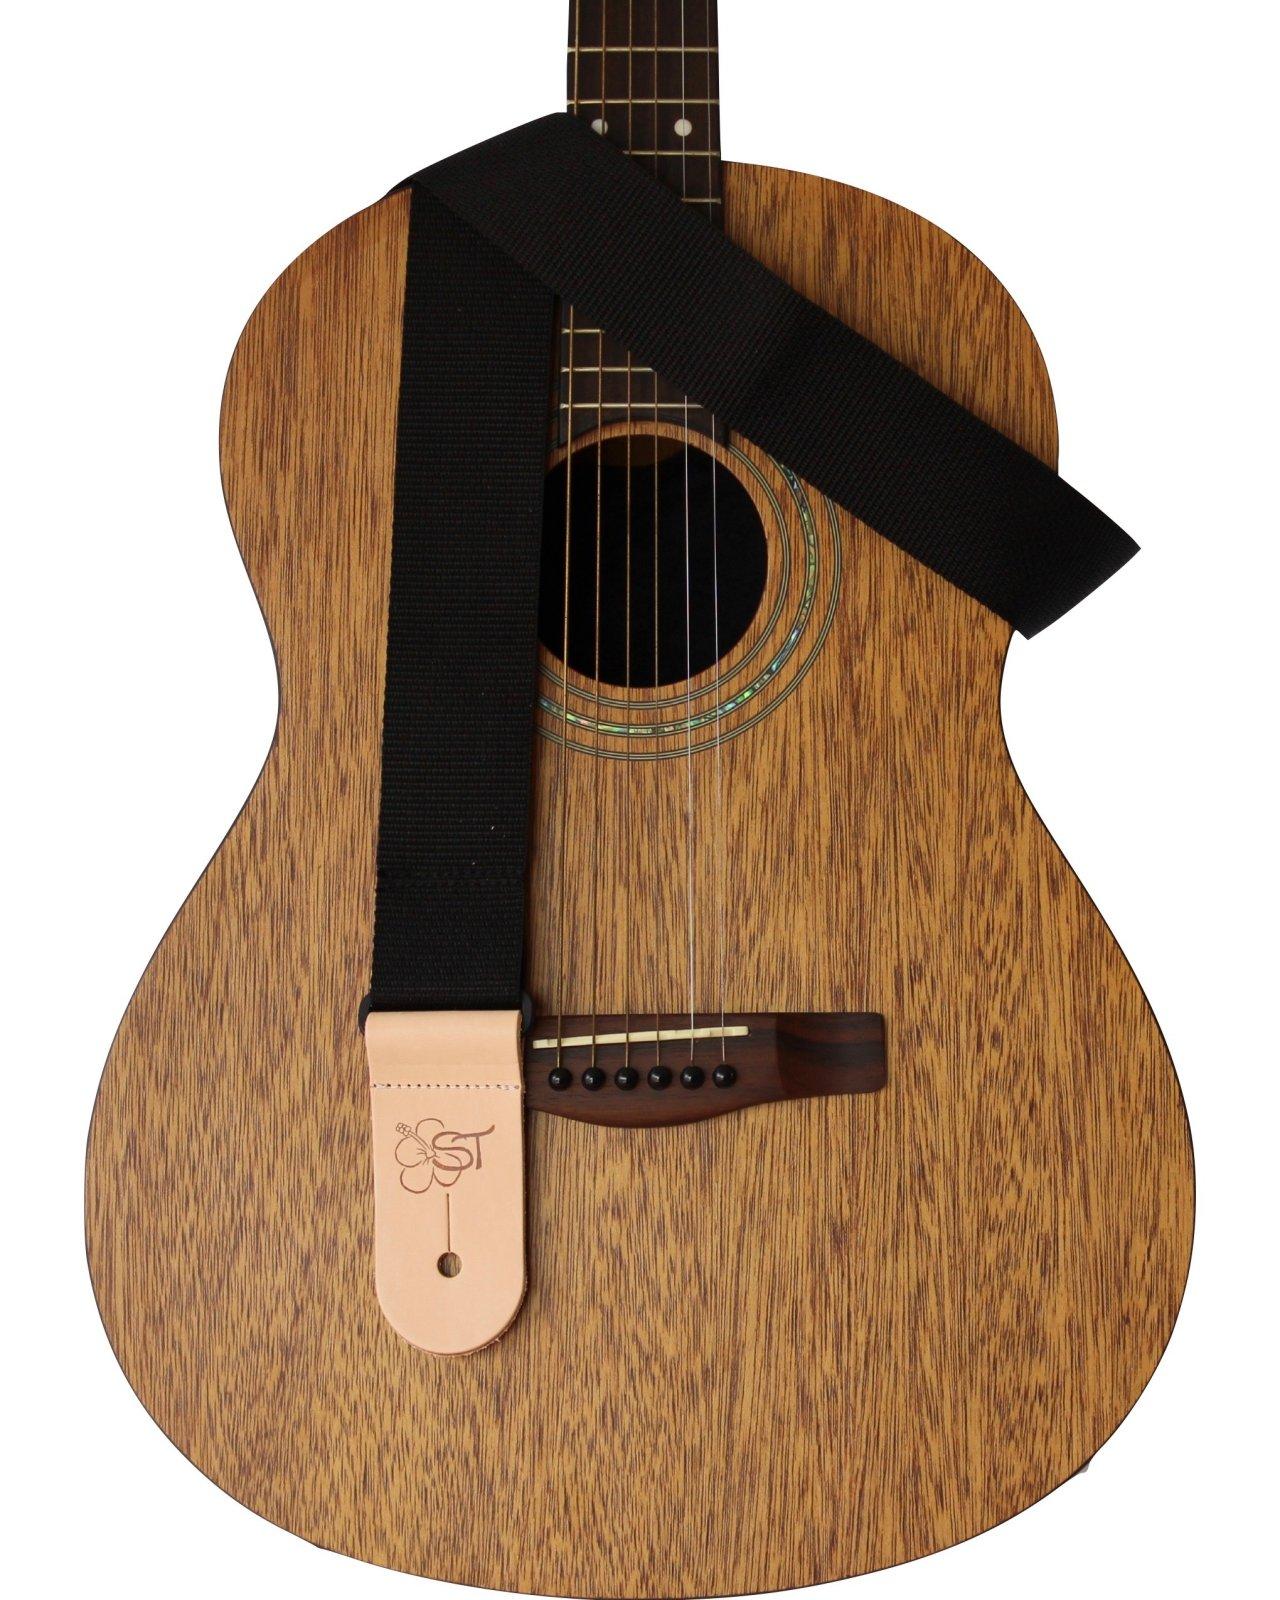 Sherrin's Threads 2 Black Guitar Strap